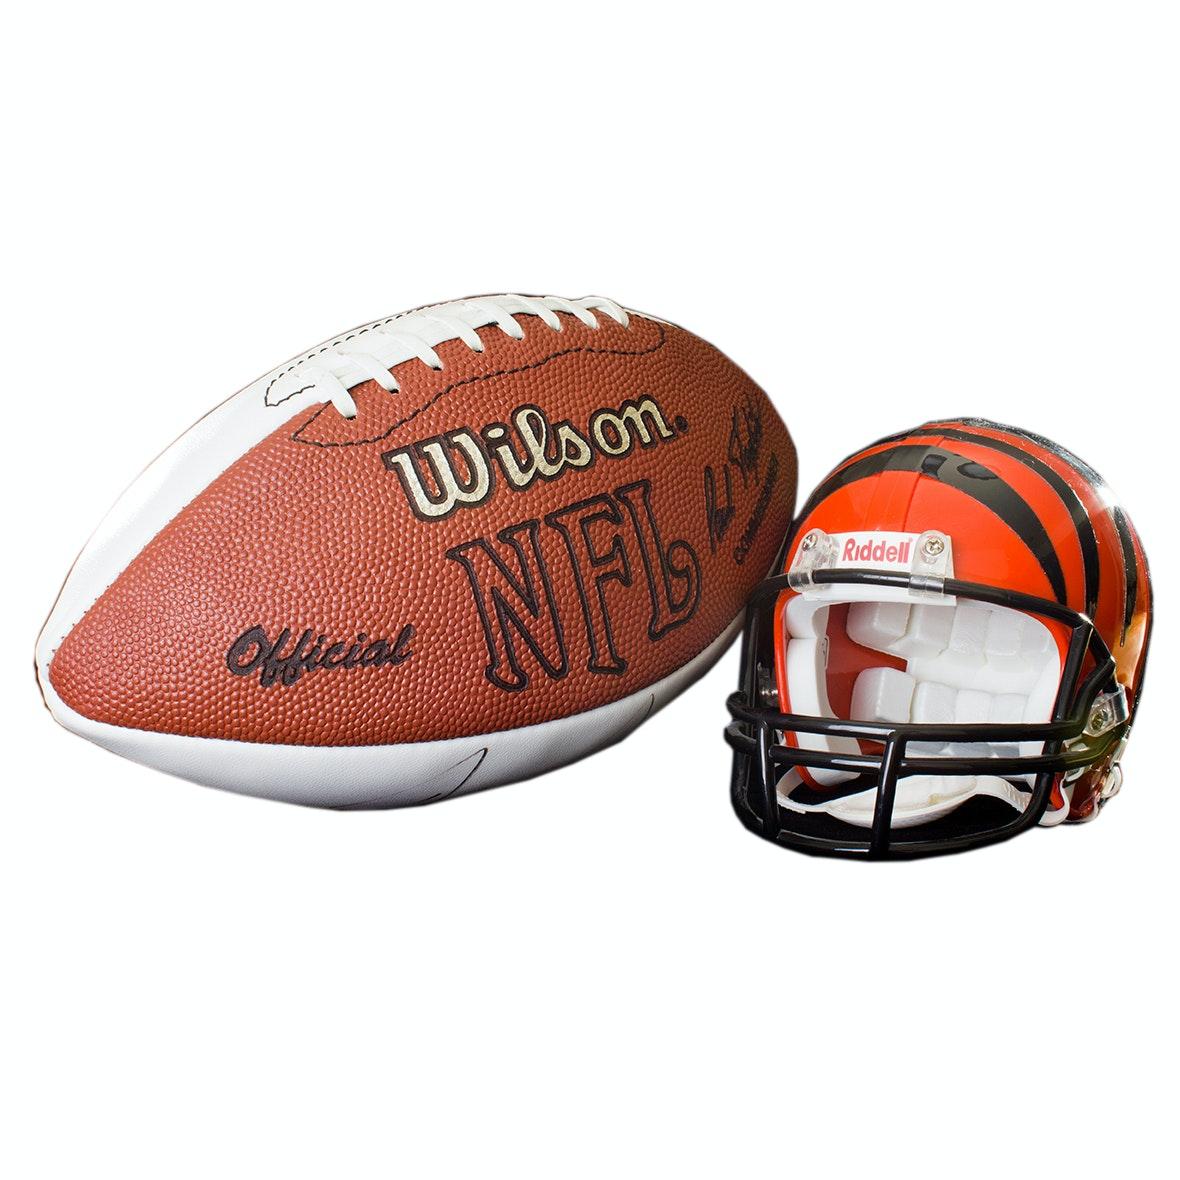 Autographed Doug Pelfrey Football and Chad Johnson Miniature Bengals Helmet